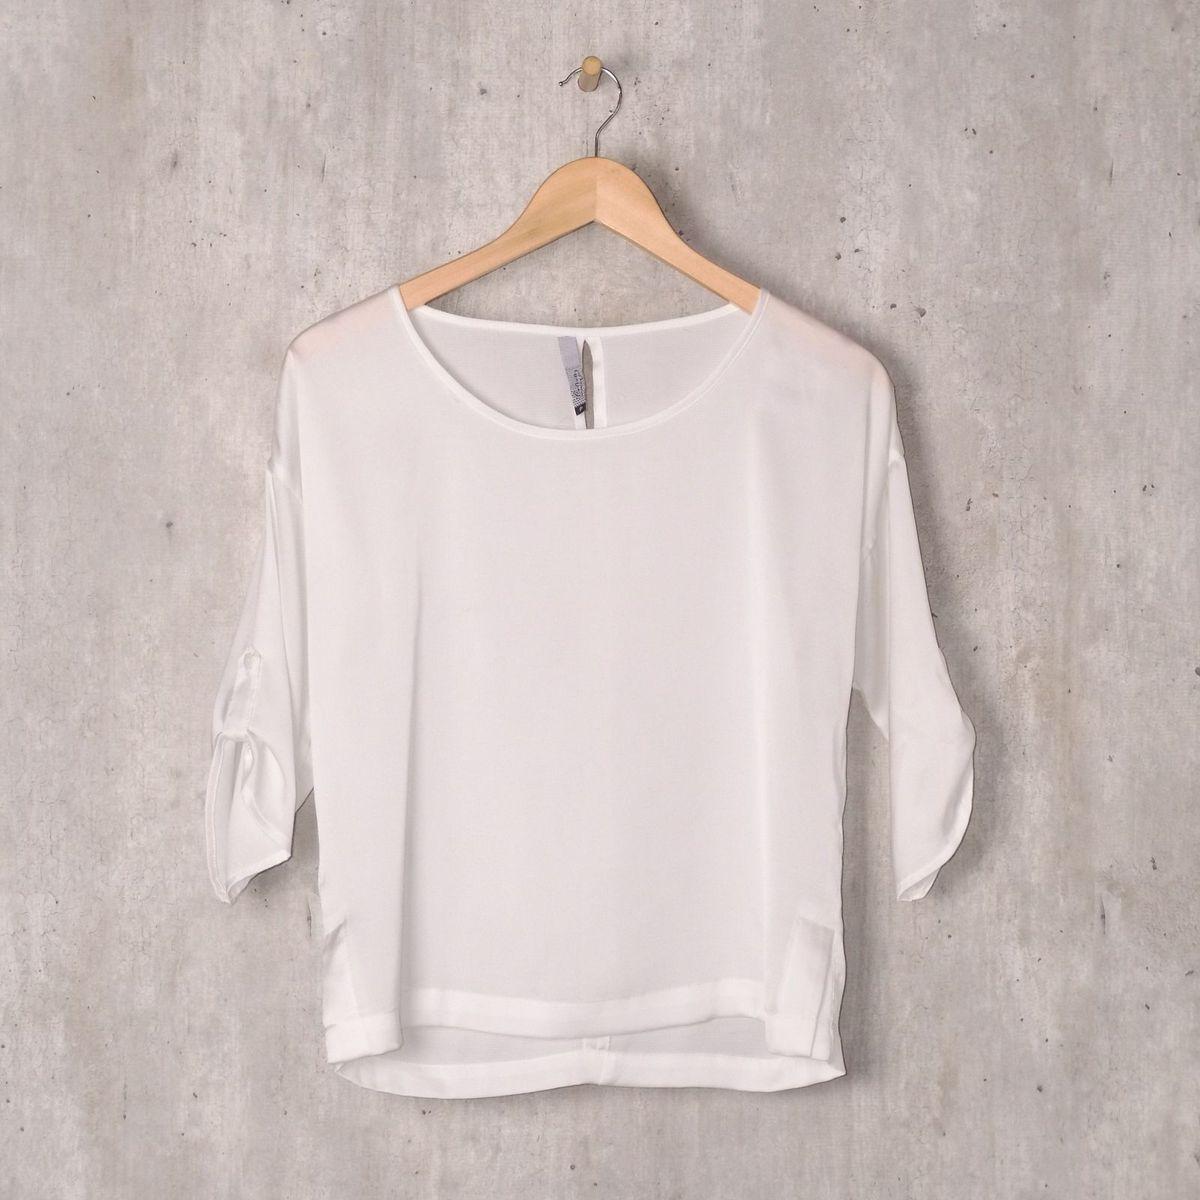 a431267d4 Blusa Branca Manga 3 4